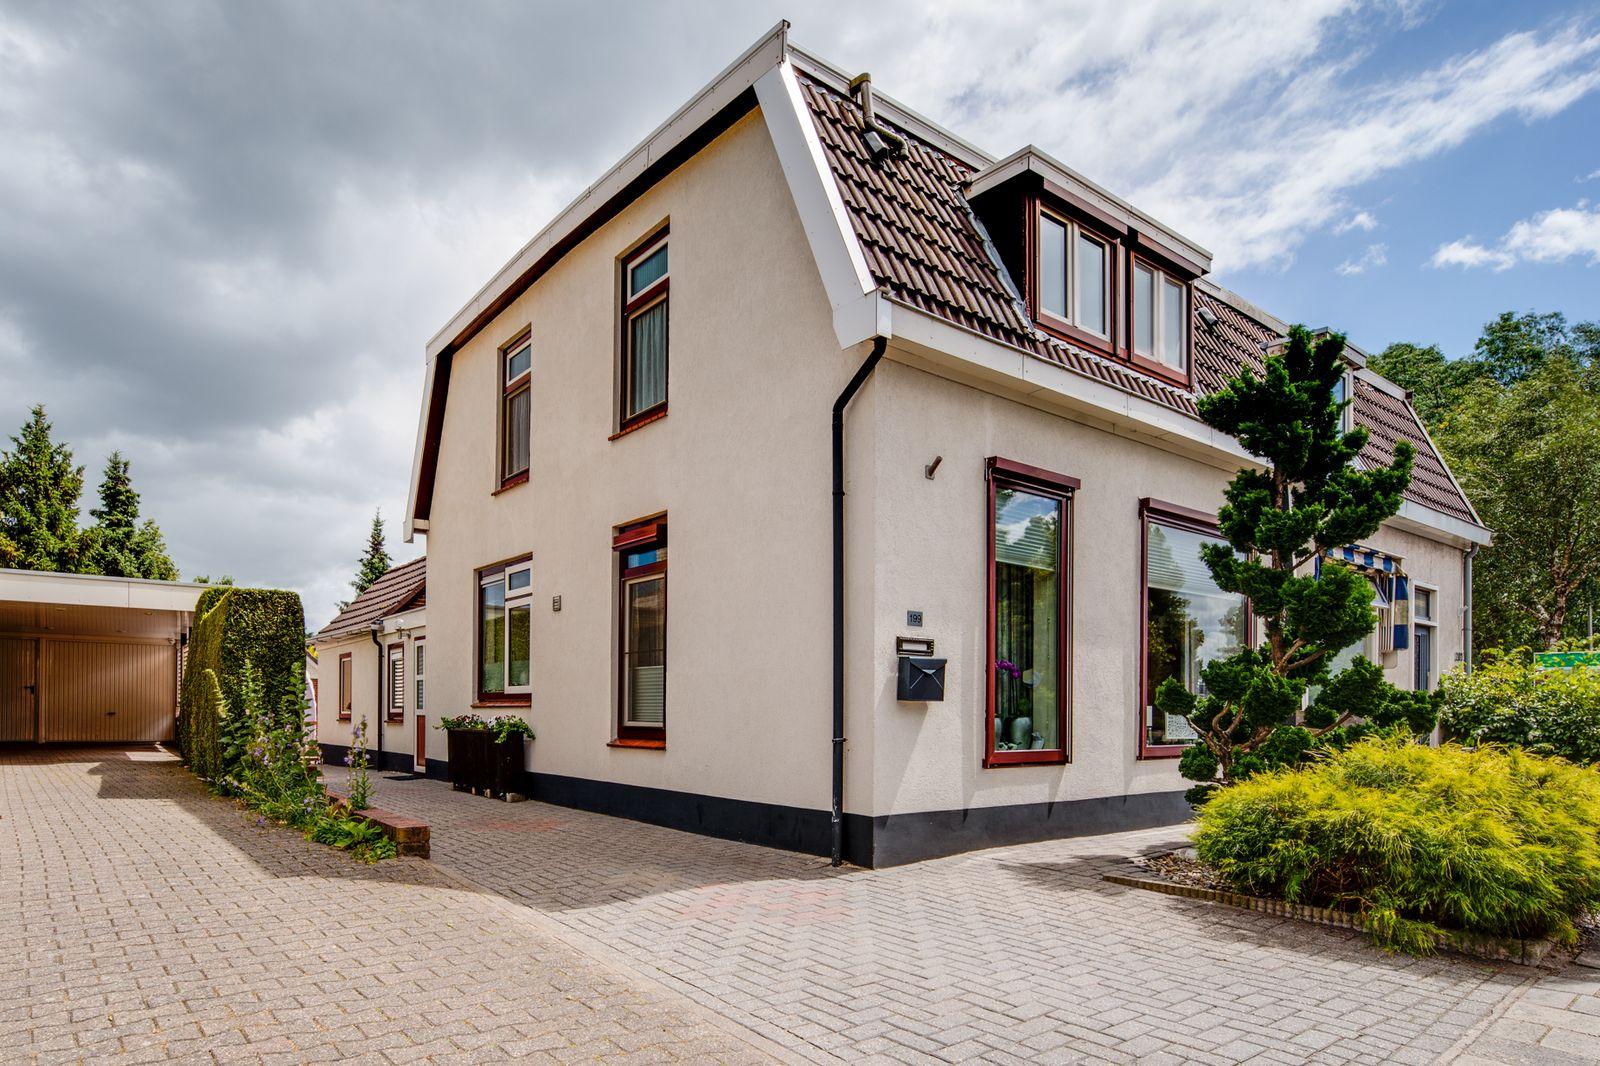 Rijssensestraat 199, Nijverdal